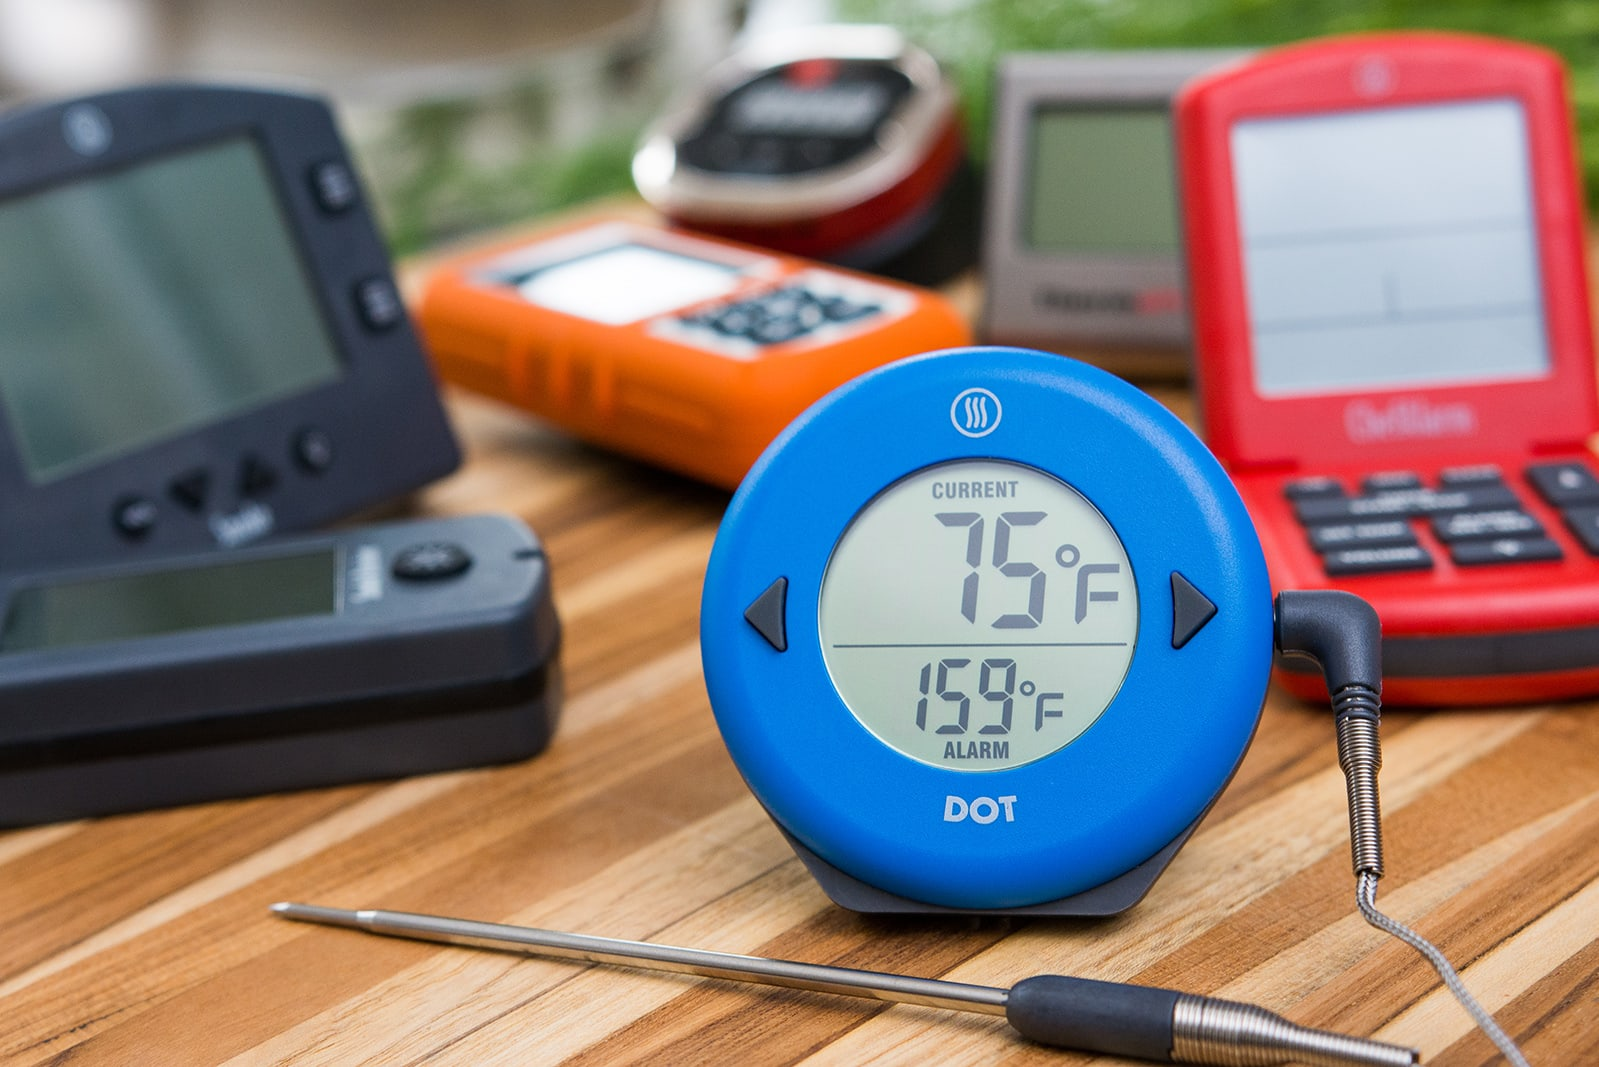 Probe thermometer